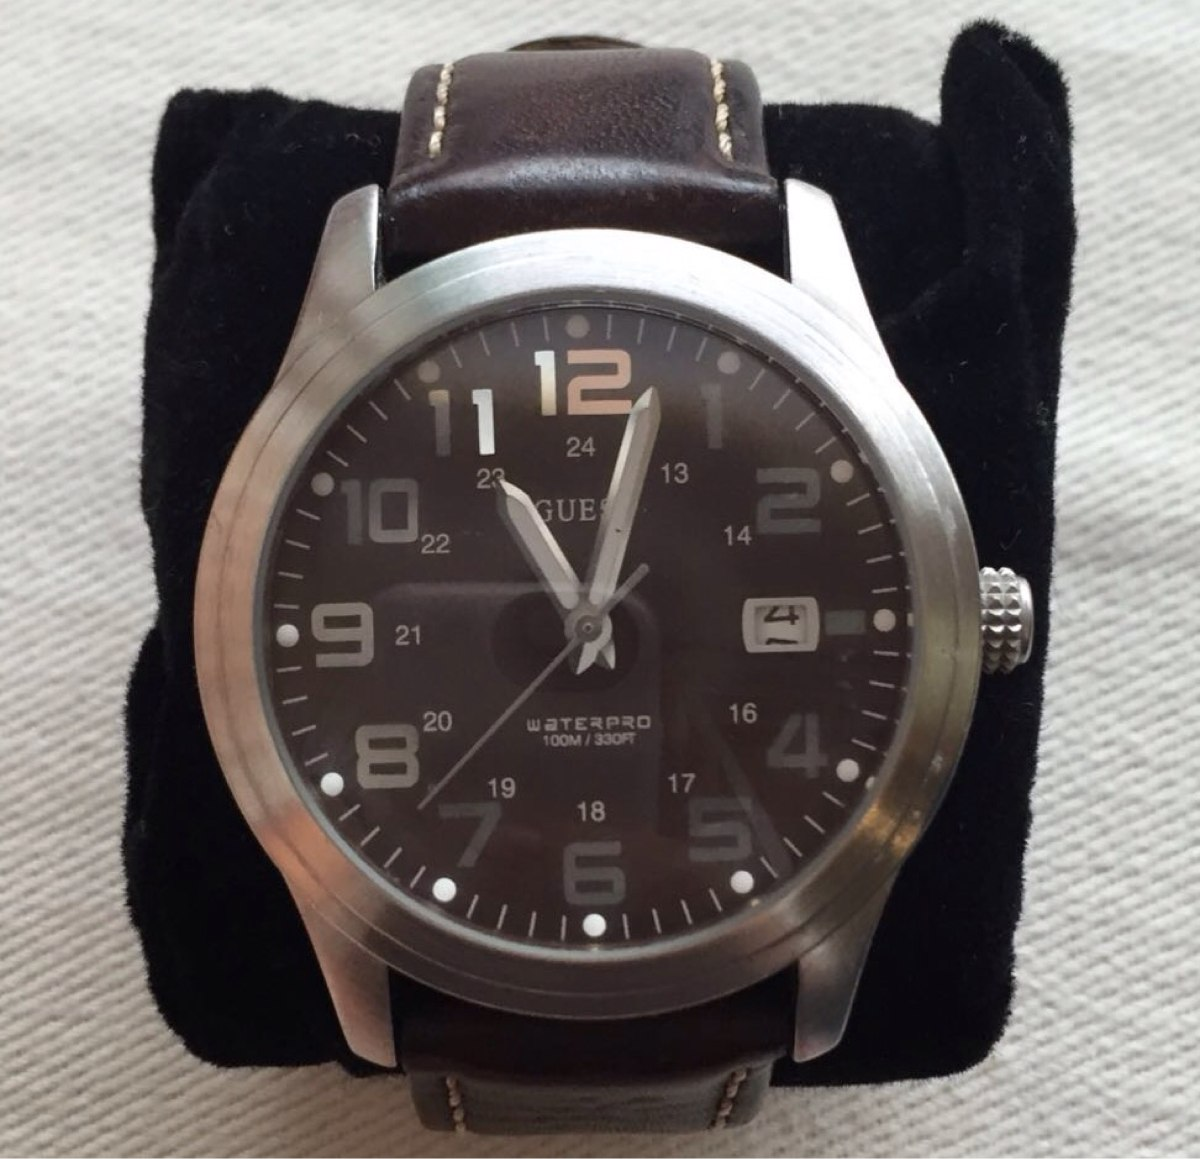 6896fe6fd62 relógio guess masculino - marrom. Carregando zoom.